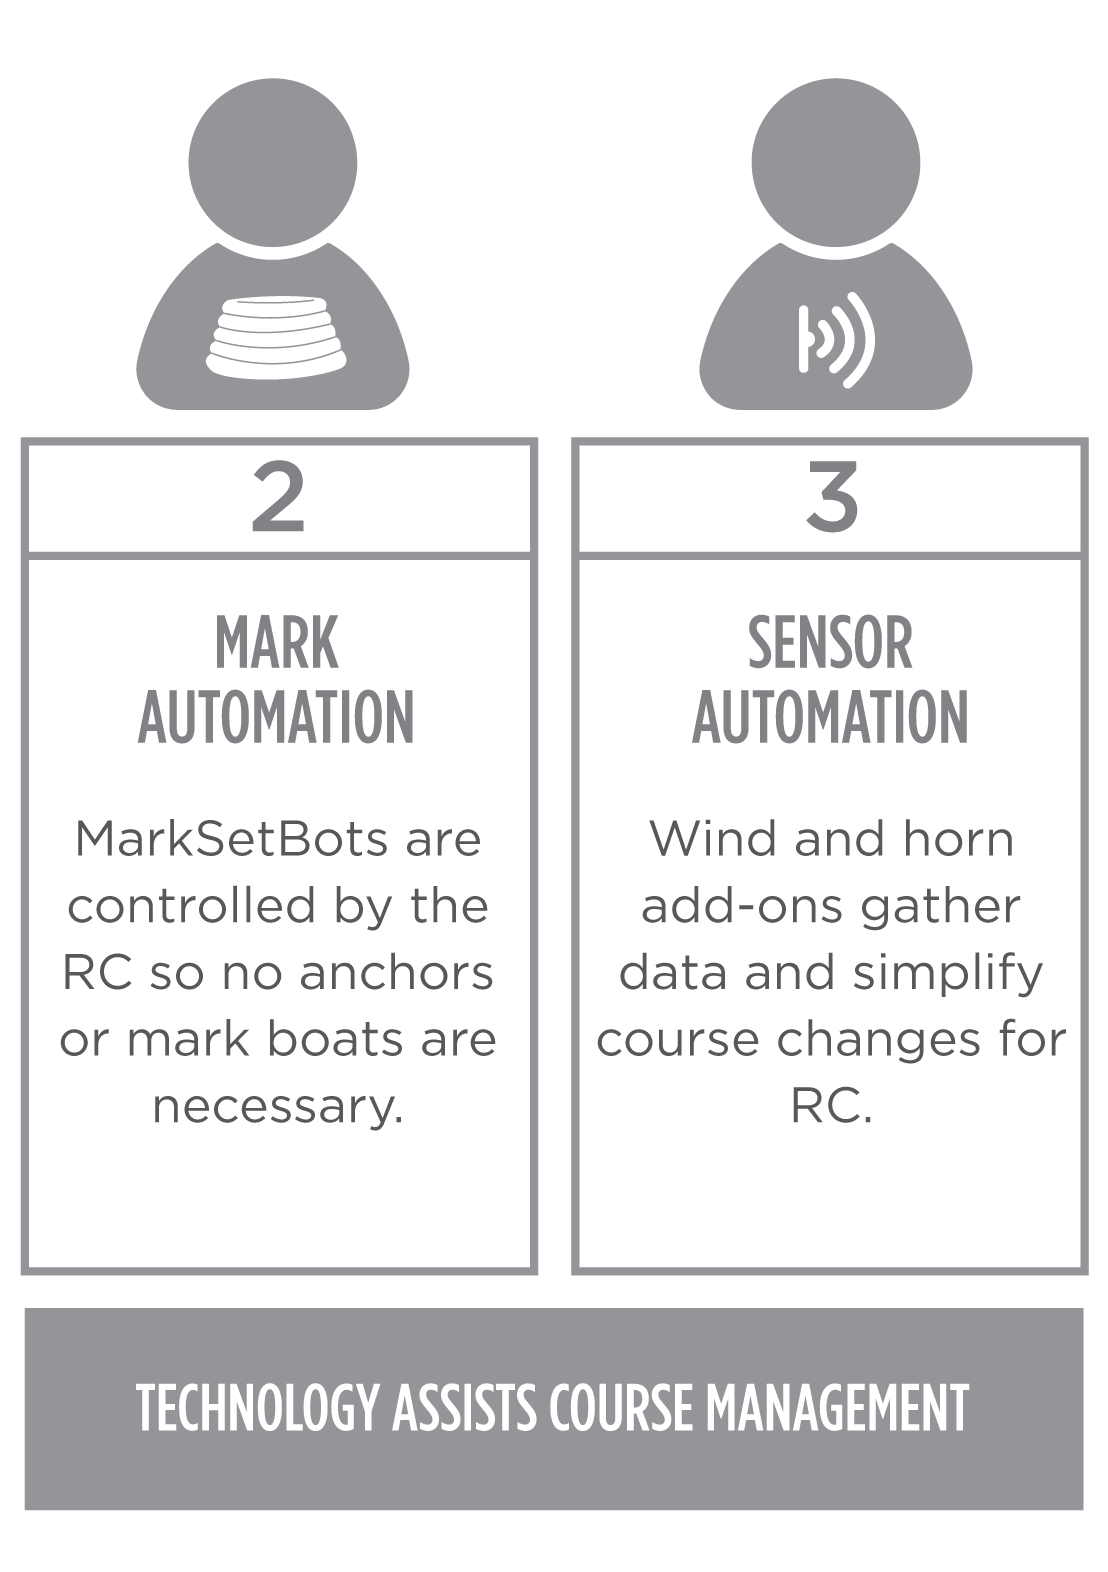 Automation Levels 1-2